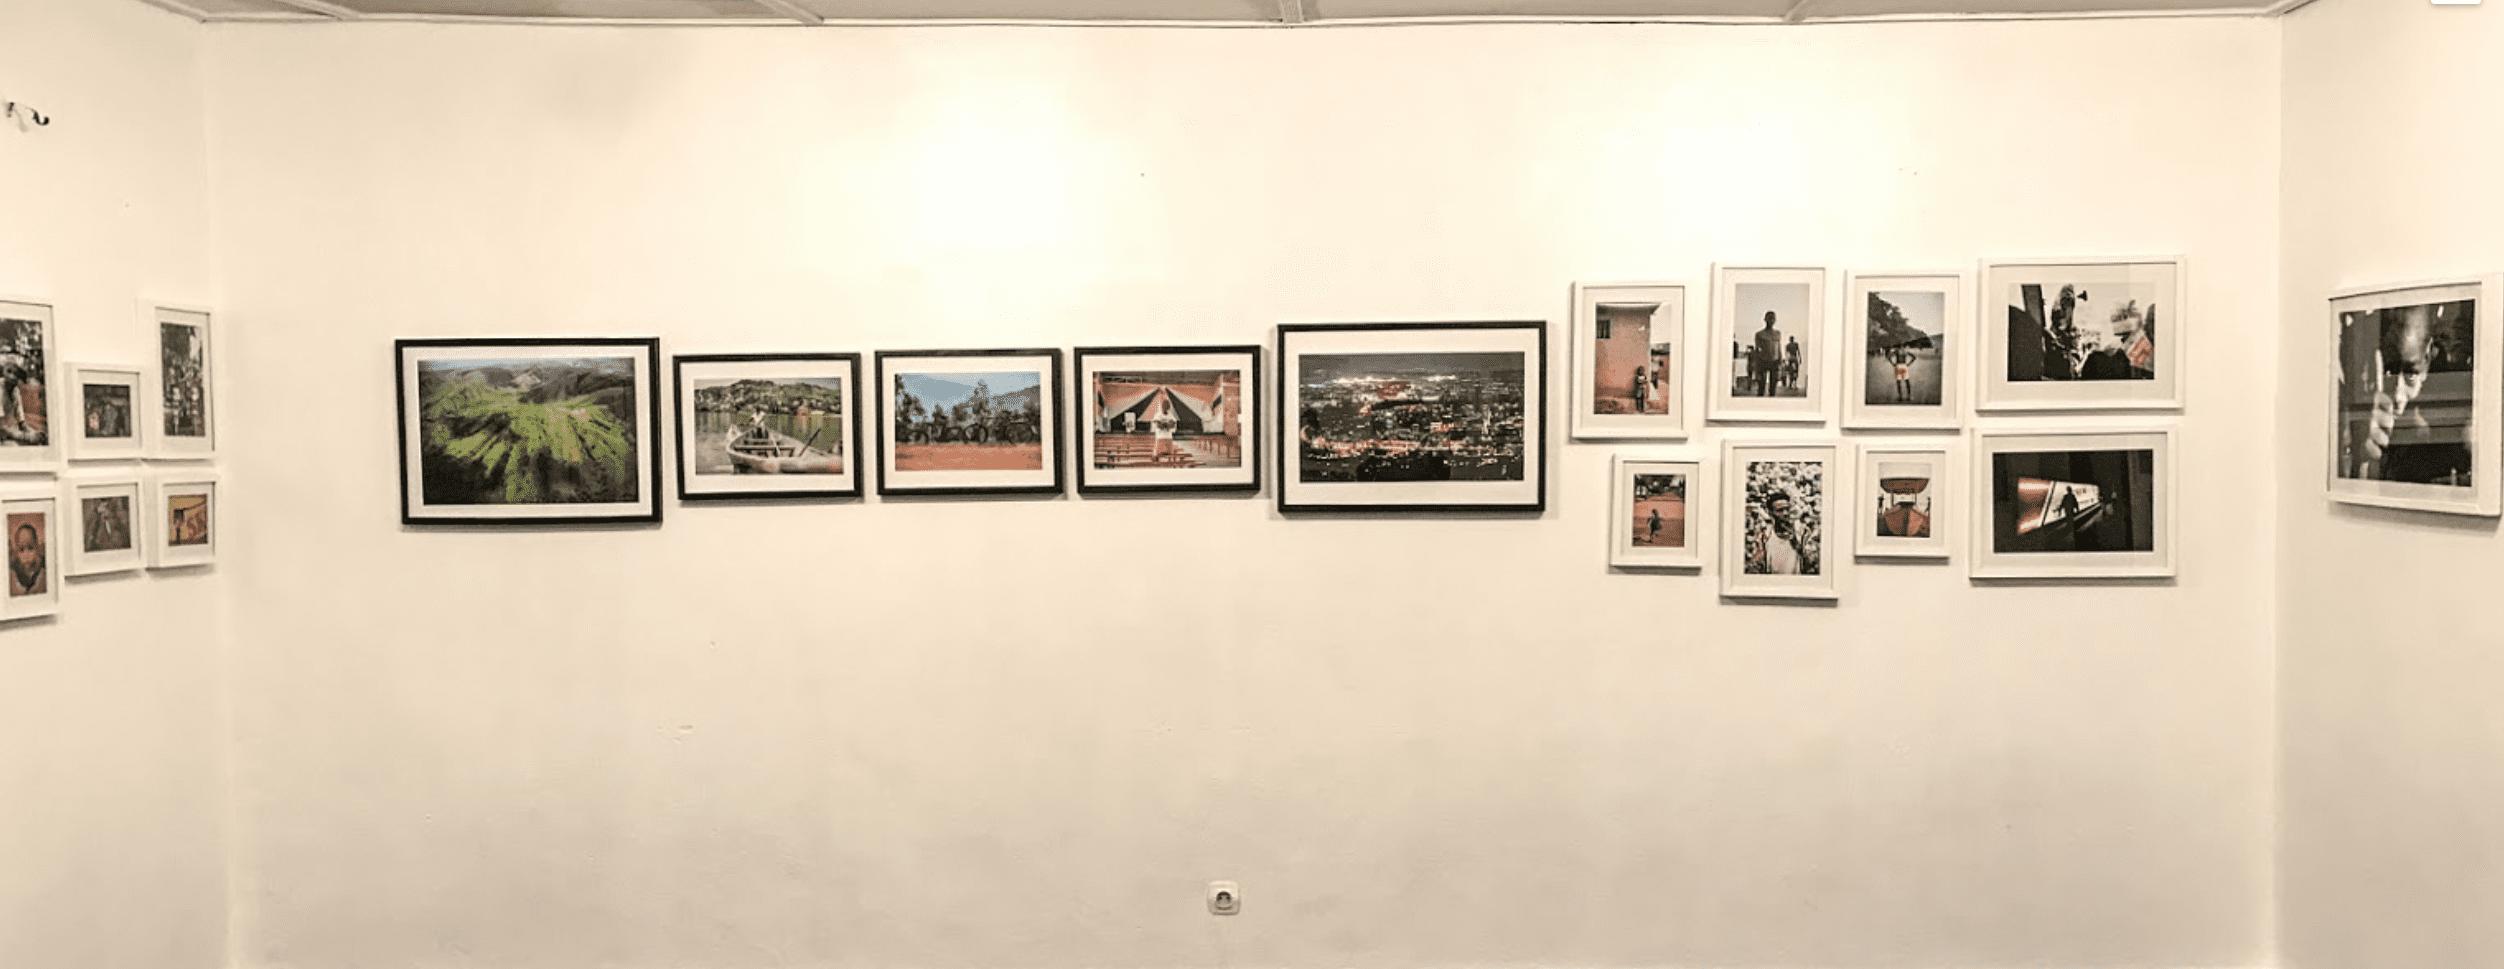 Top Museums Art Galleries in Kigali